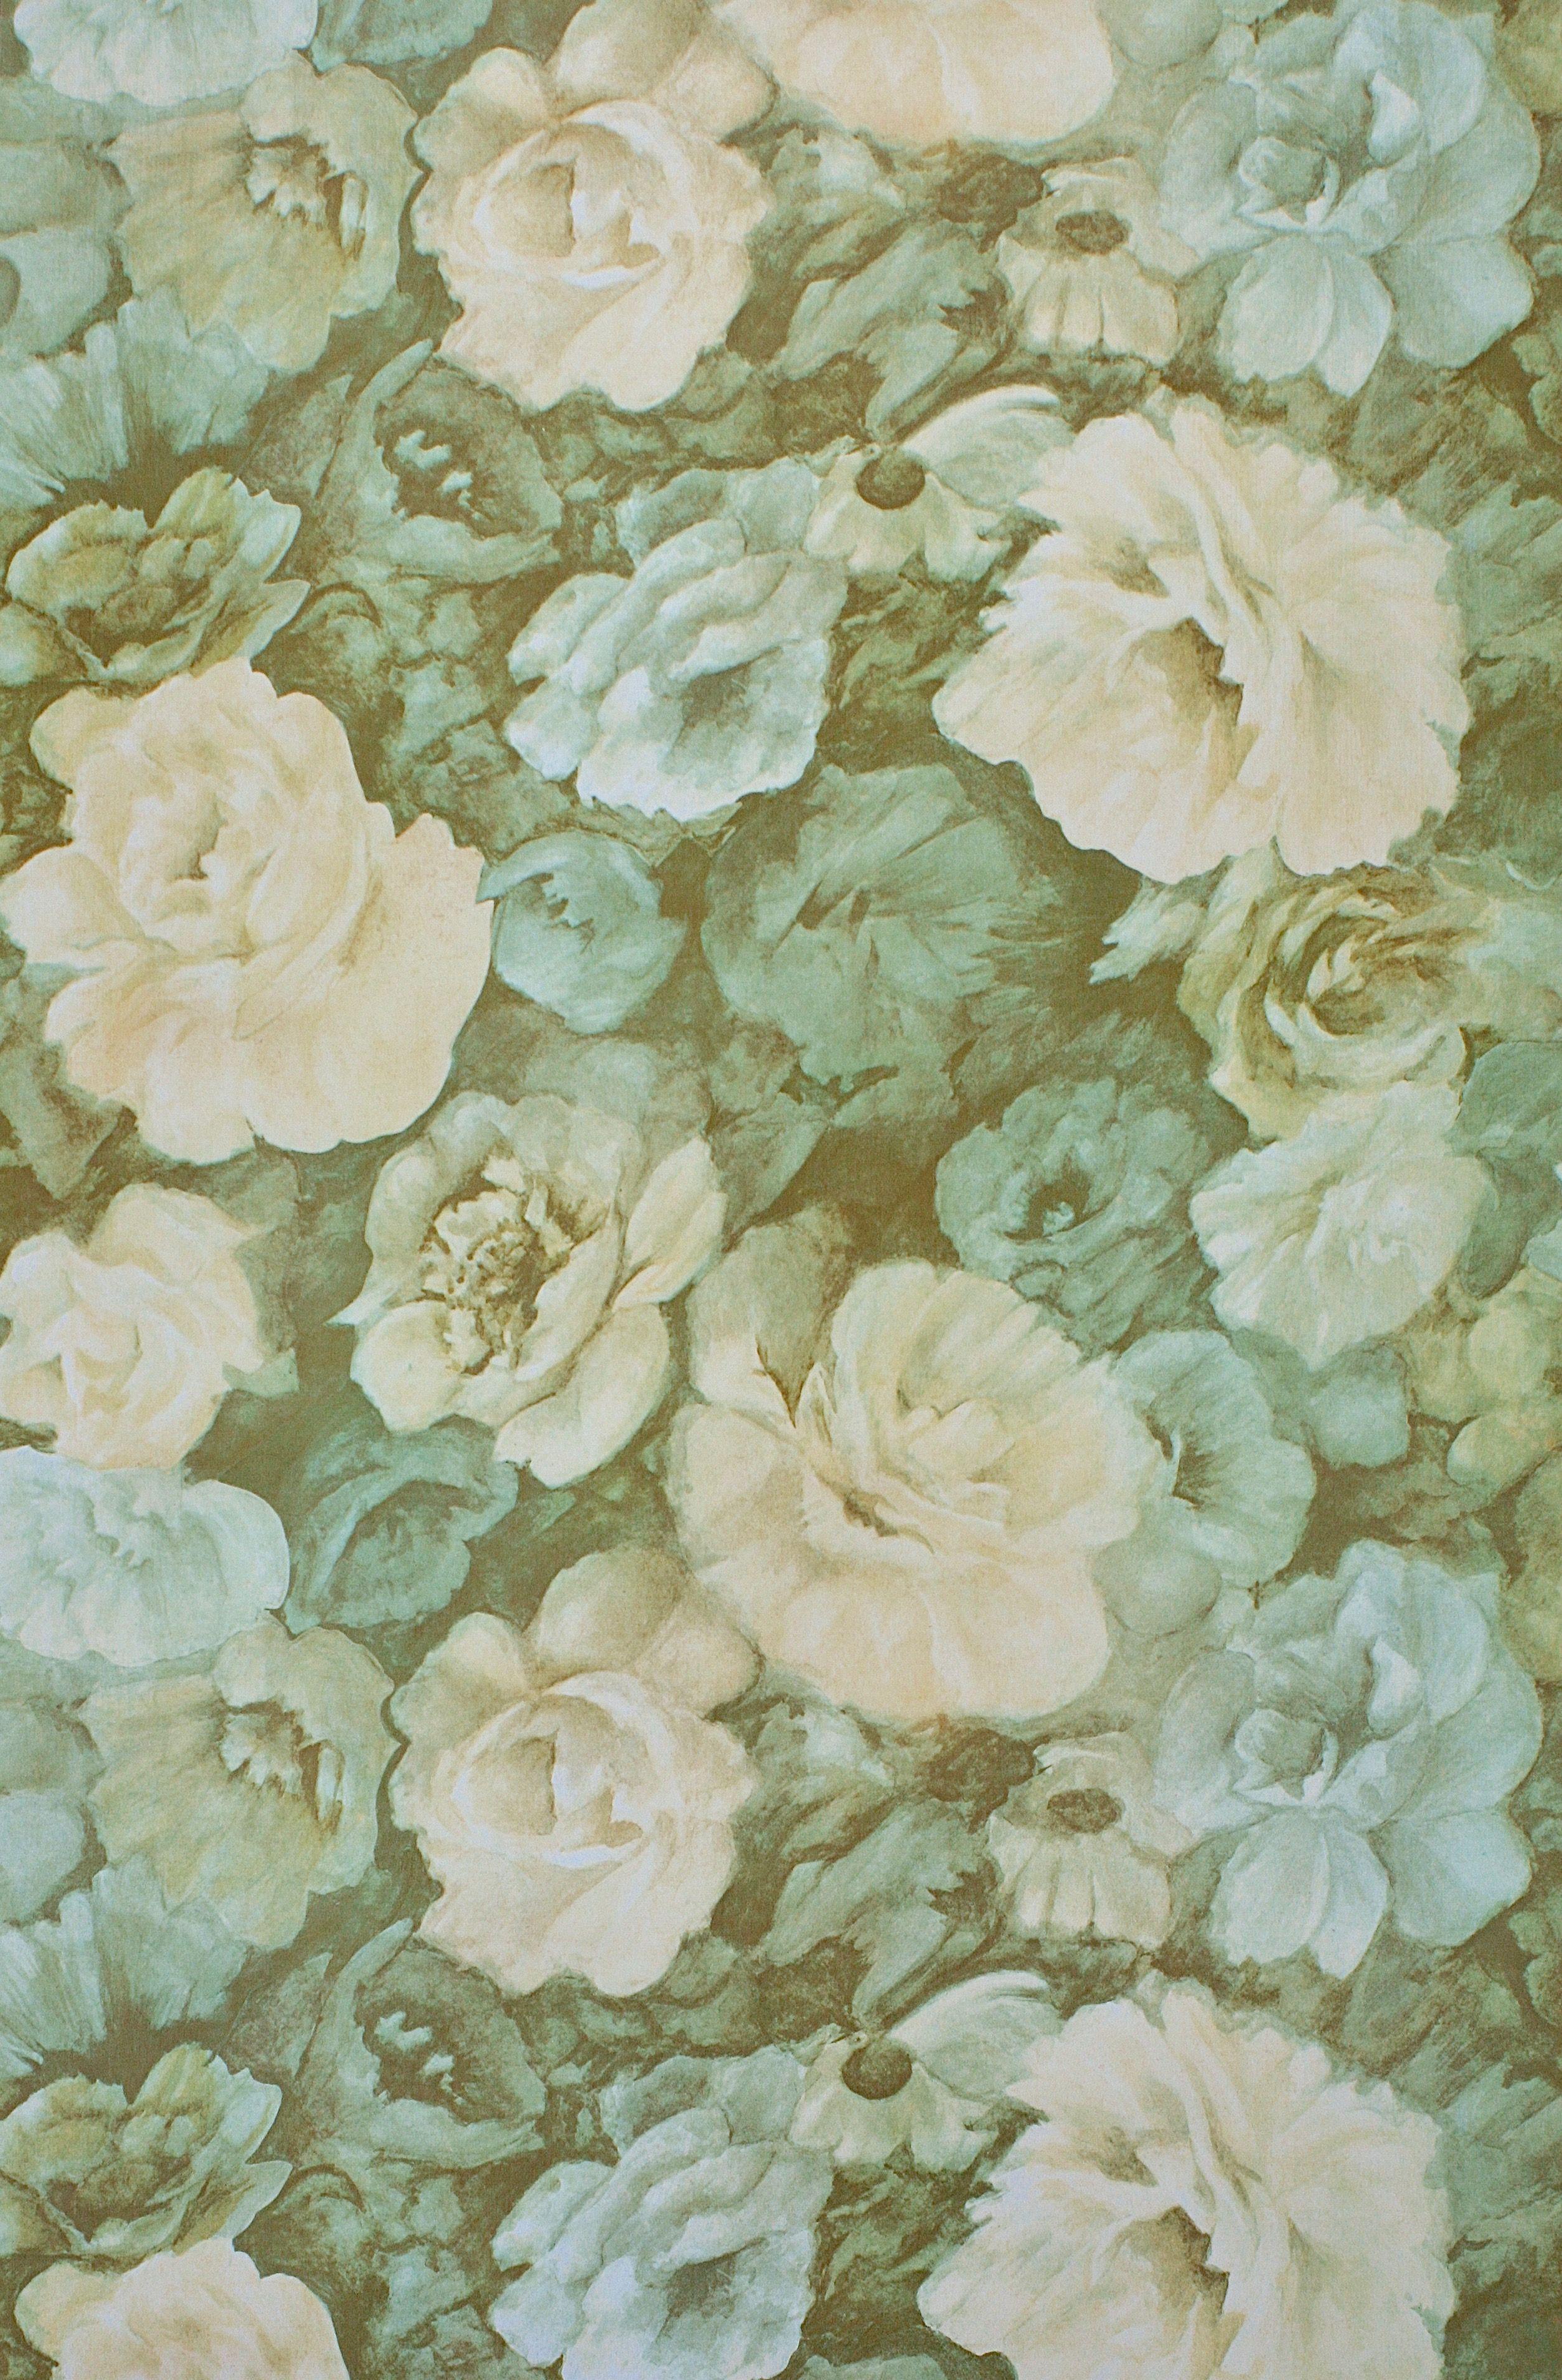 dc6e38fcb7 Vintage Floral Wallpapers - Top Free Vintage Floral Backgrounds ...